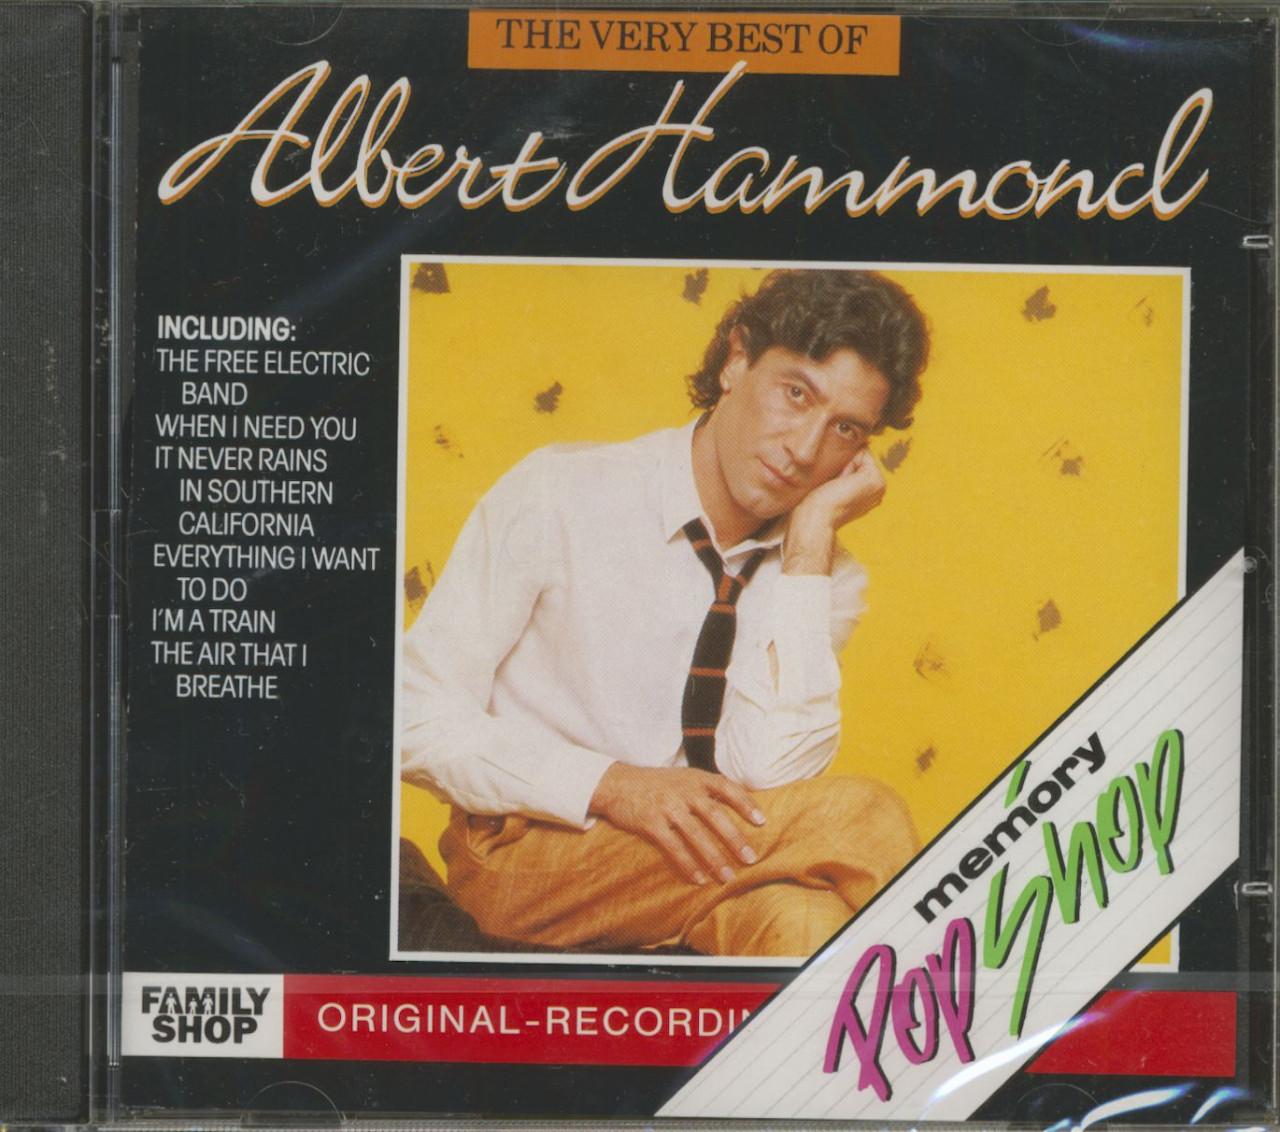 Albert Hammond - The Very Best Of Albert Hammond (CD)